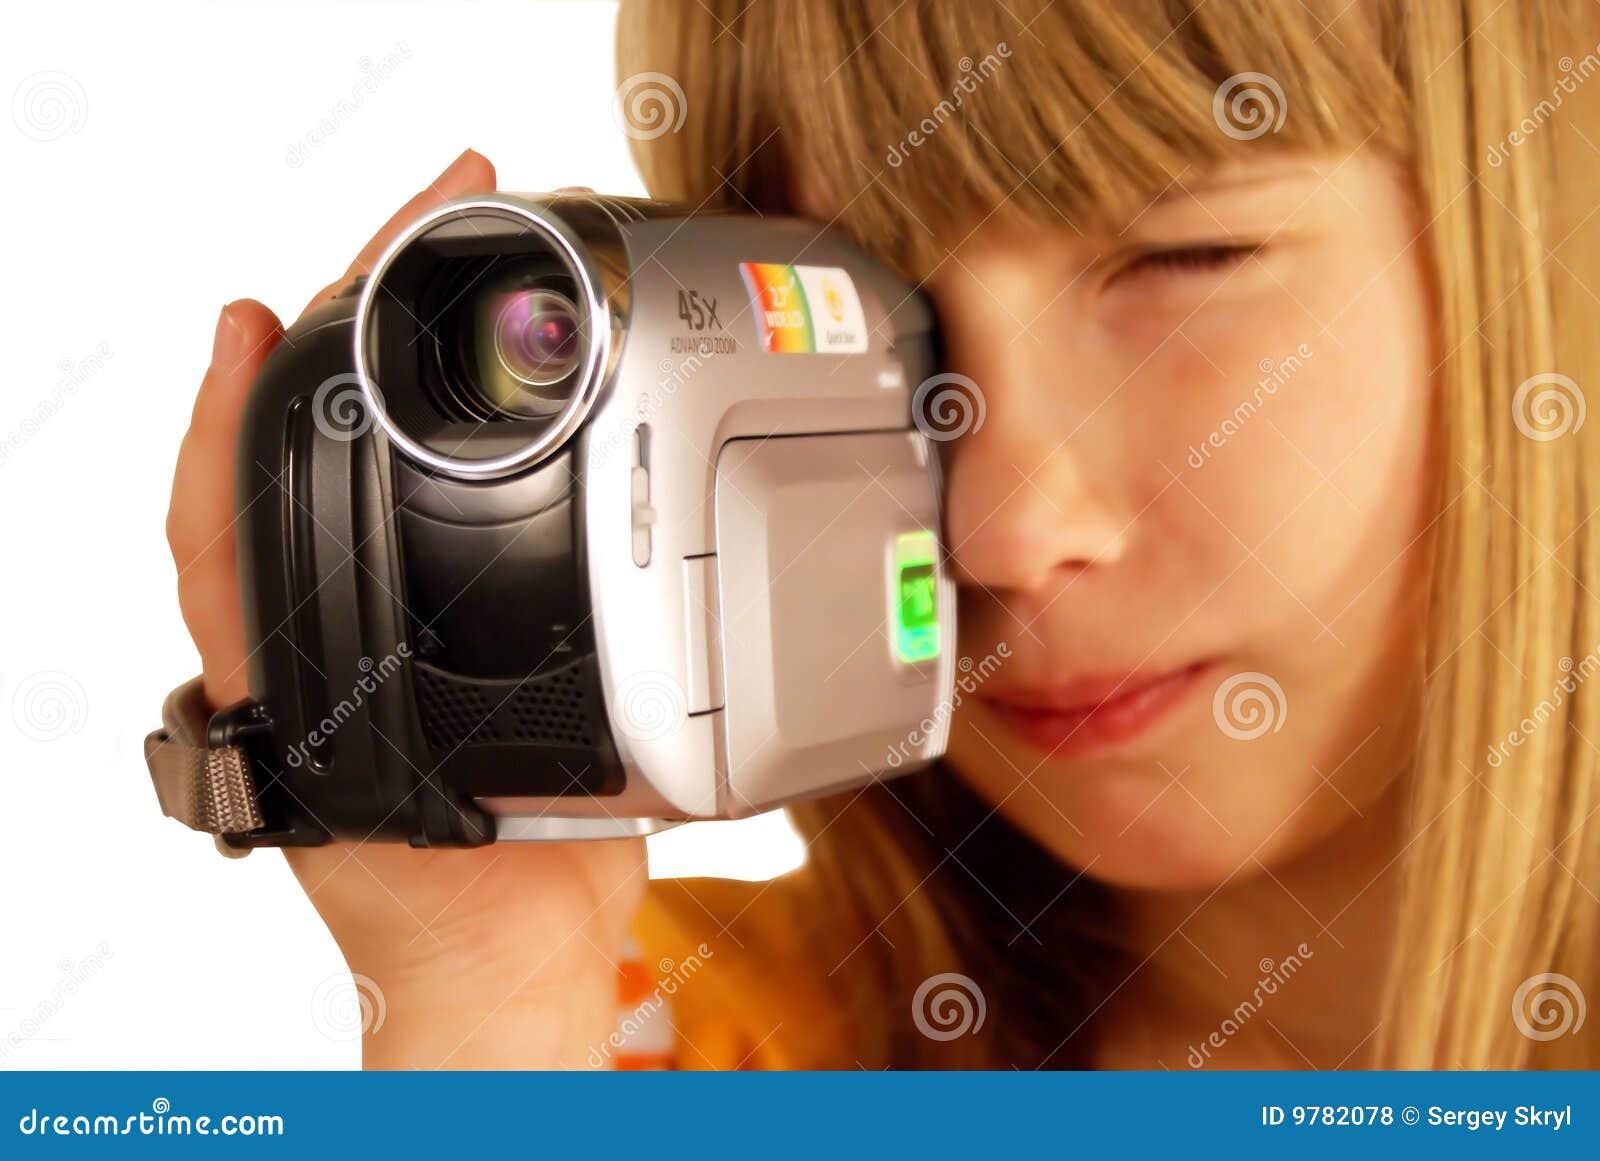 girls online camera